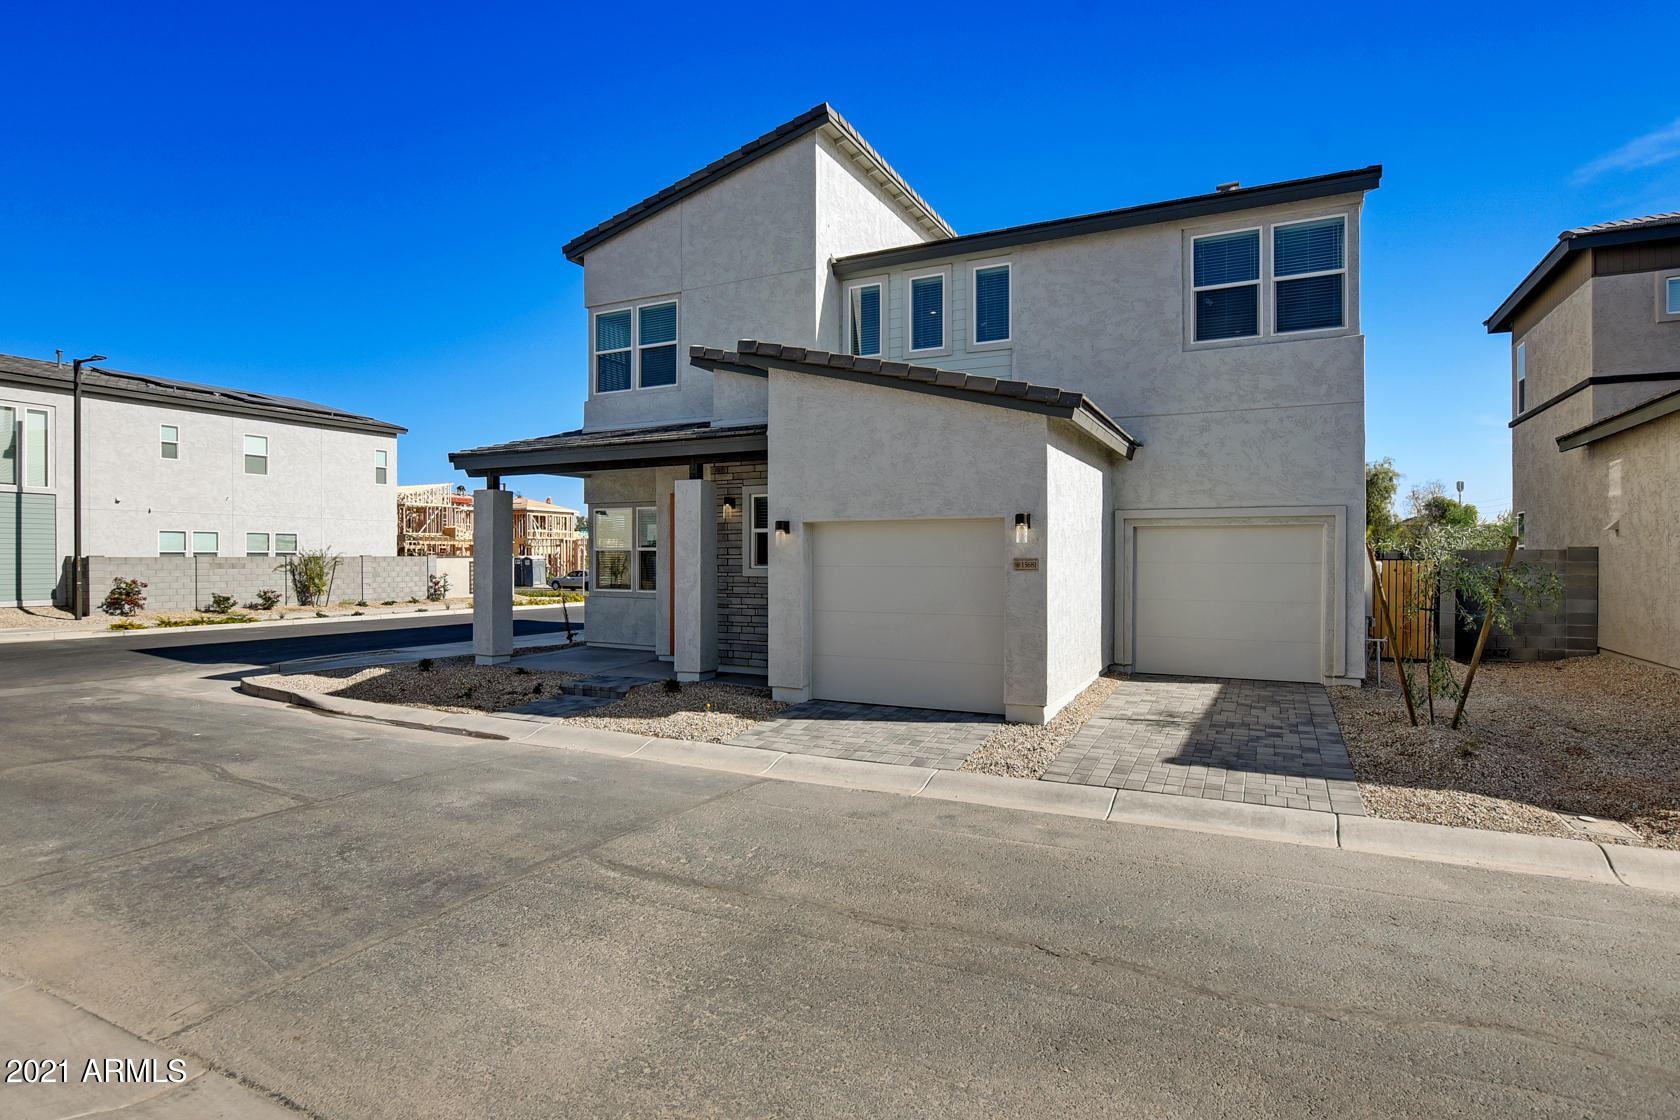 Photo of 15681 W MELVIN Street, Goodyear, AZ 85338 (MLS # 6266916)